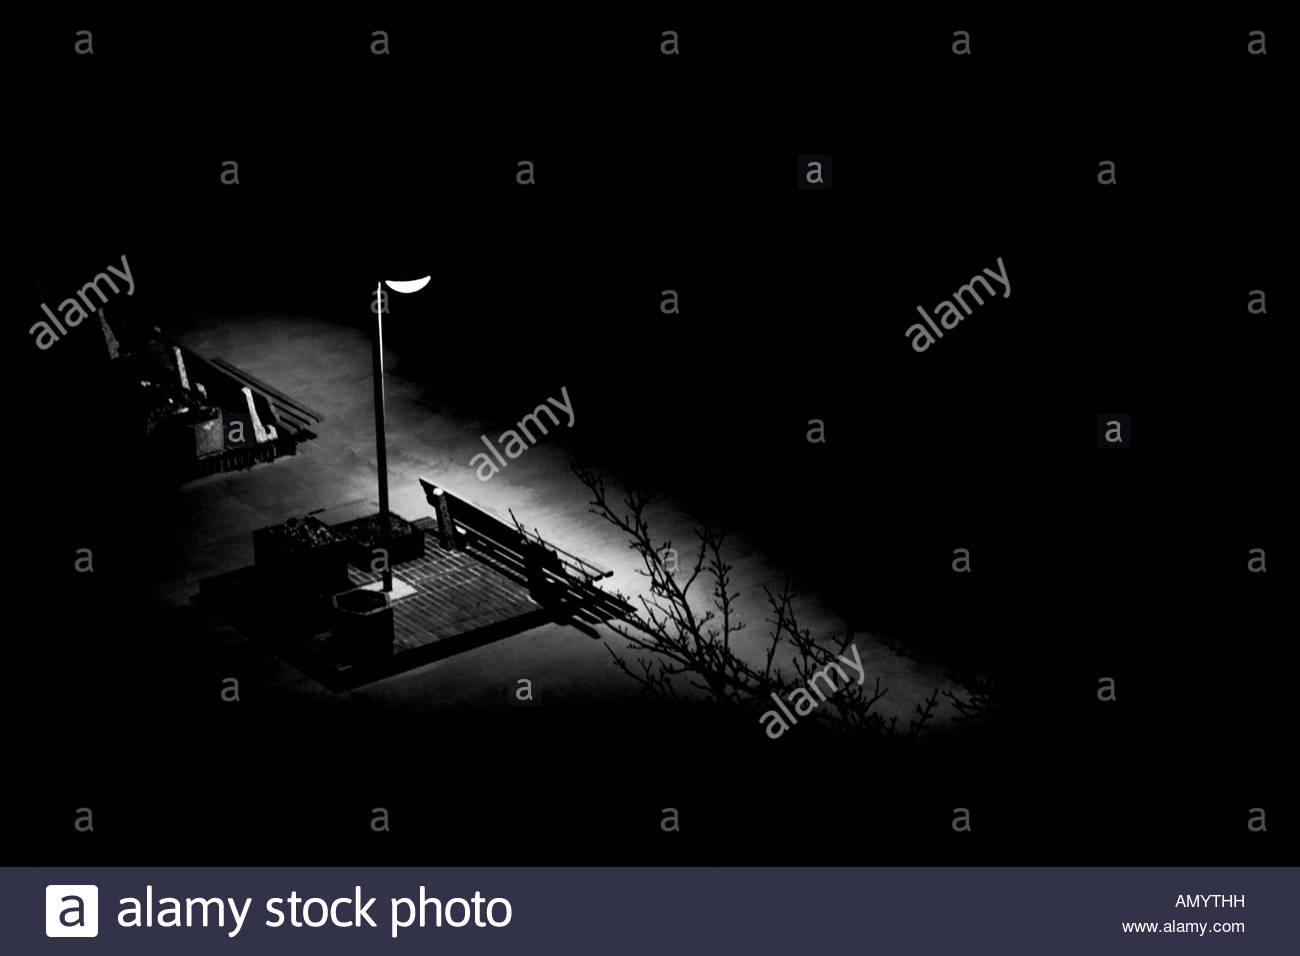 Panchina Con Lampioni Seduti : A torino i lampioni si innamorano pagina di bellaweb